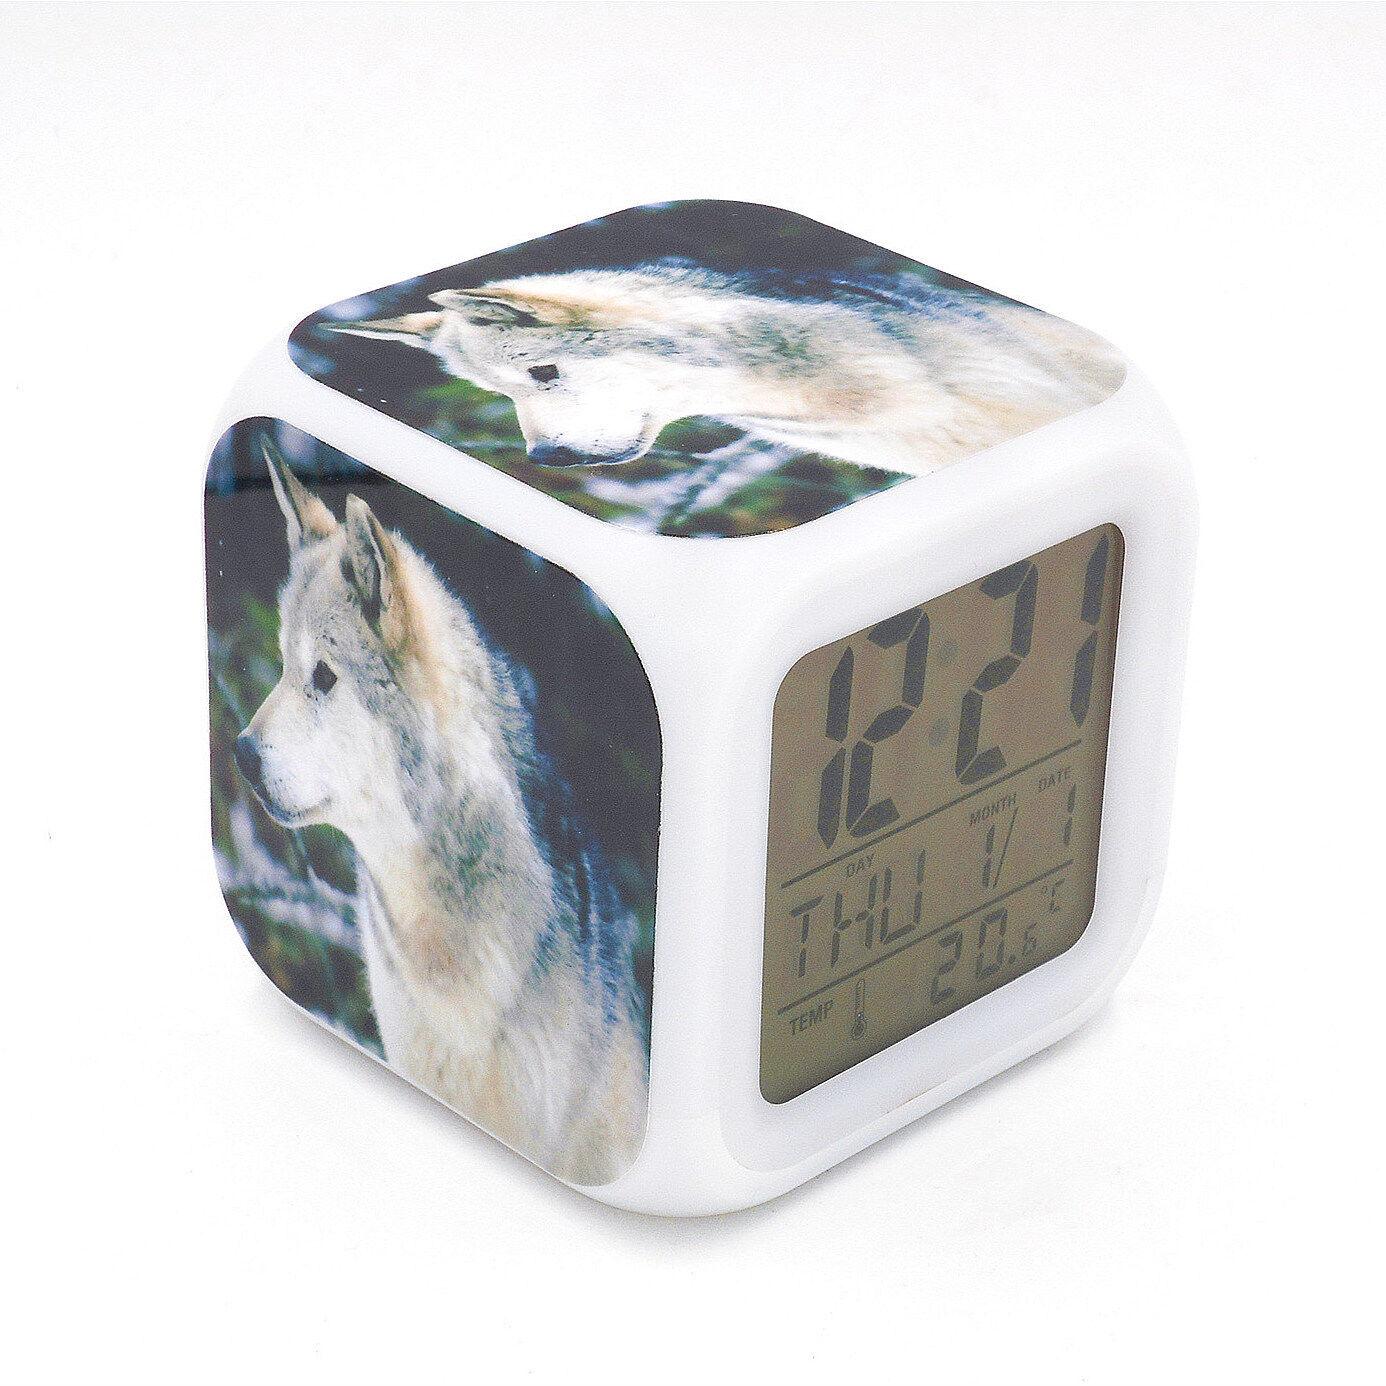 White Wolf Snow Led Alarm Clock Creative Desk Digital Clock for Adult Kids Toy